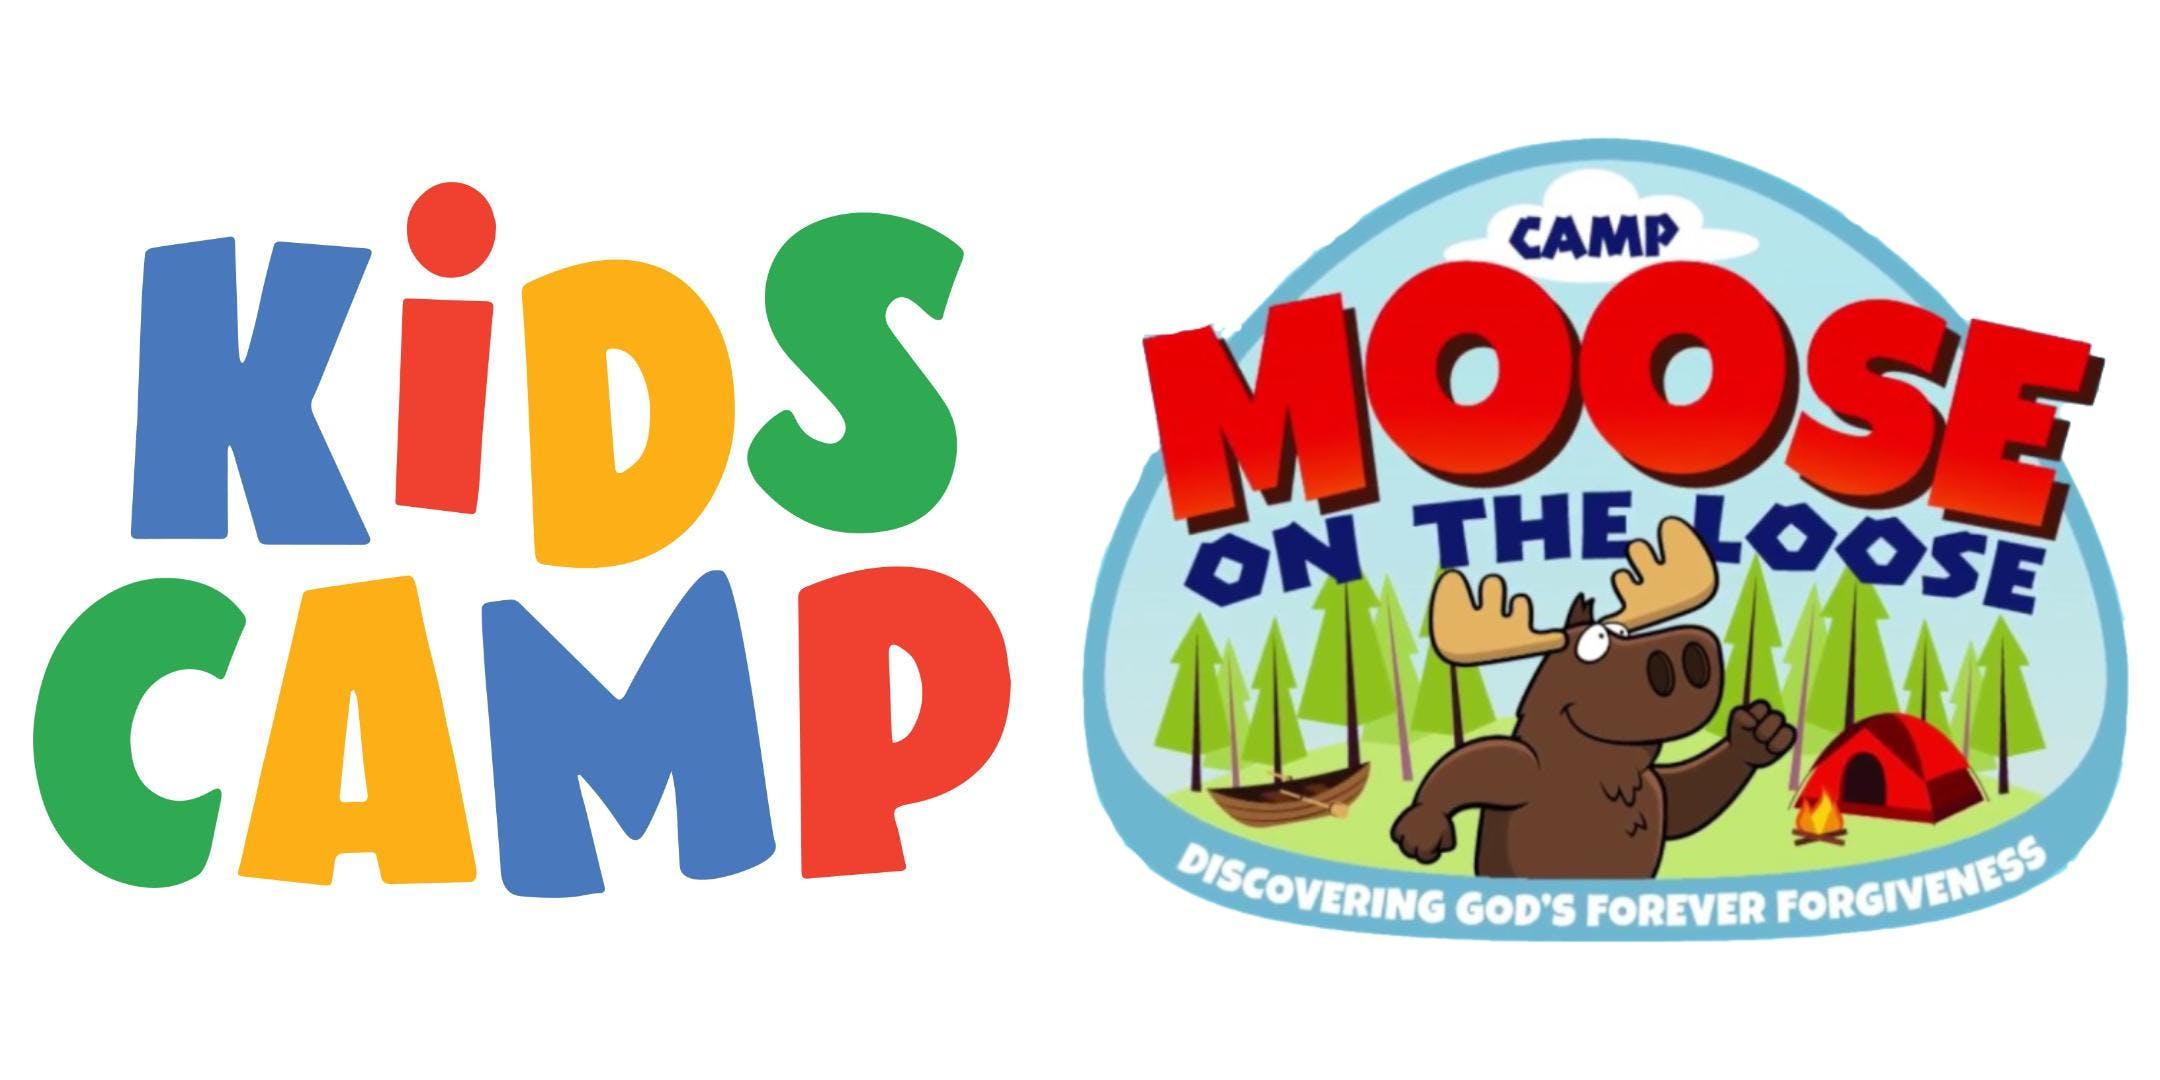 Kids Camp: Moose on the Loose